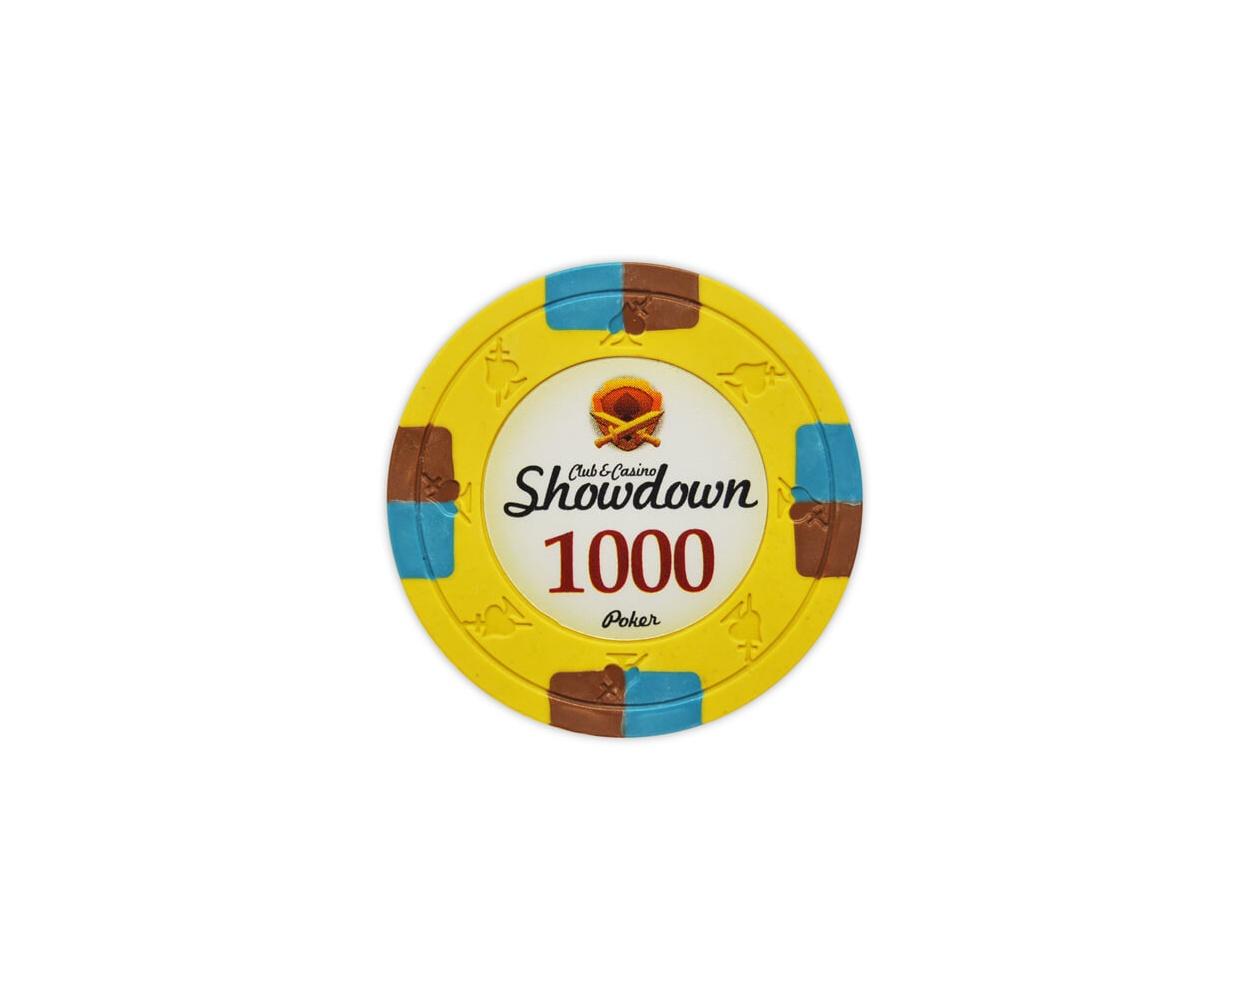 Showdown - $1000 Yellow Clay Poker Chips